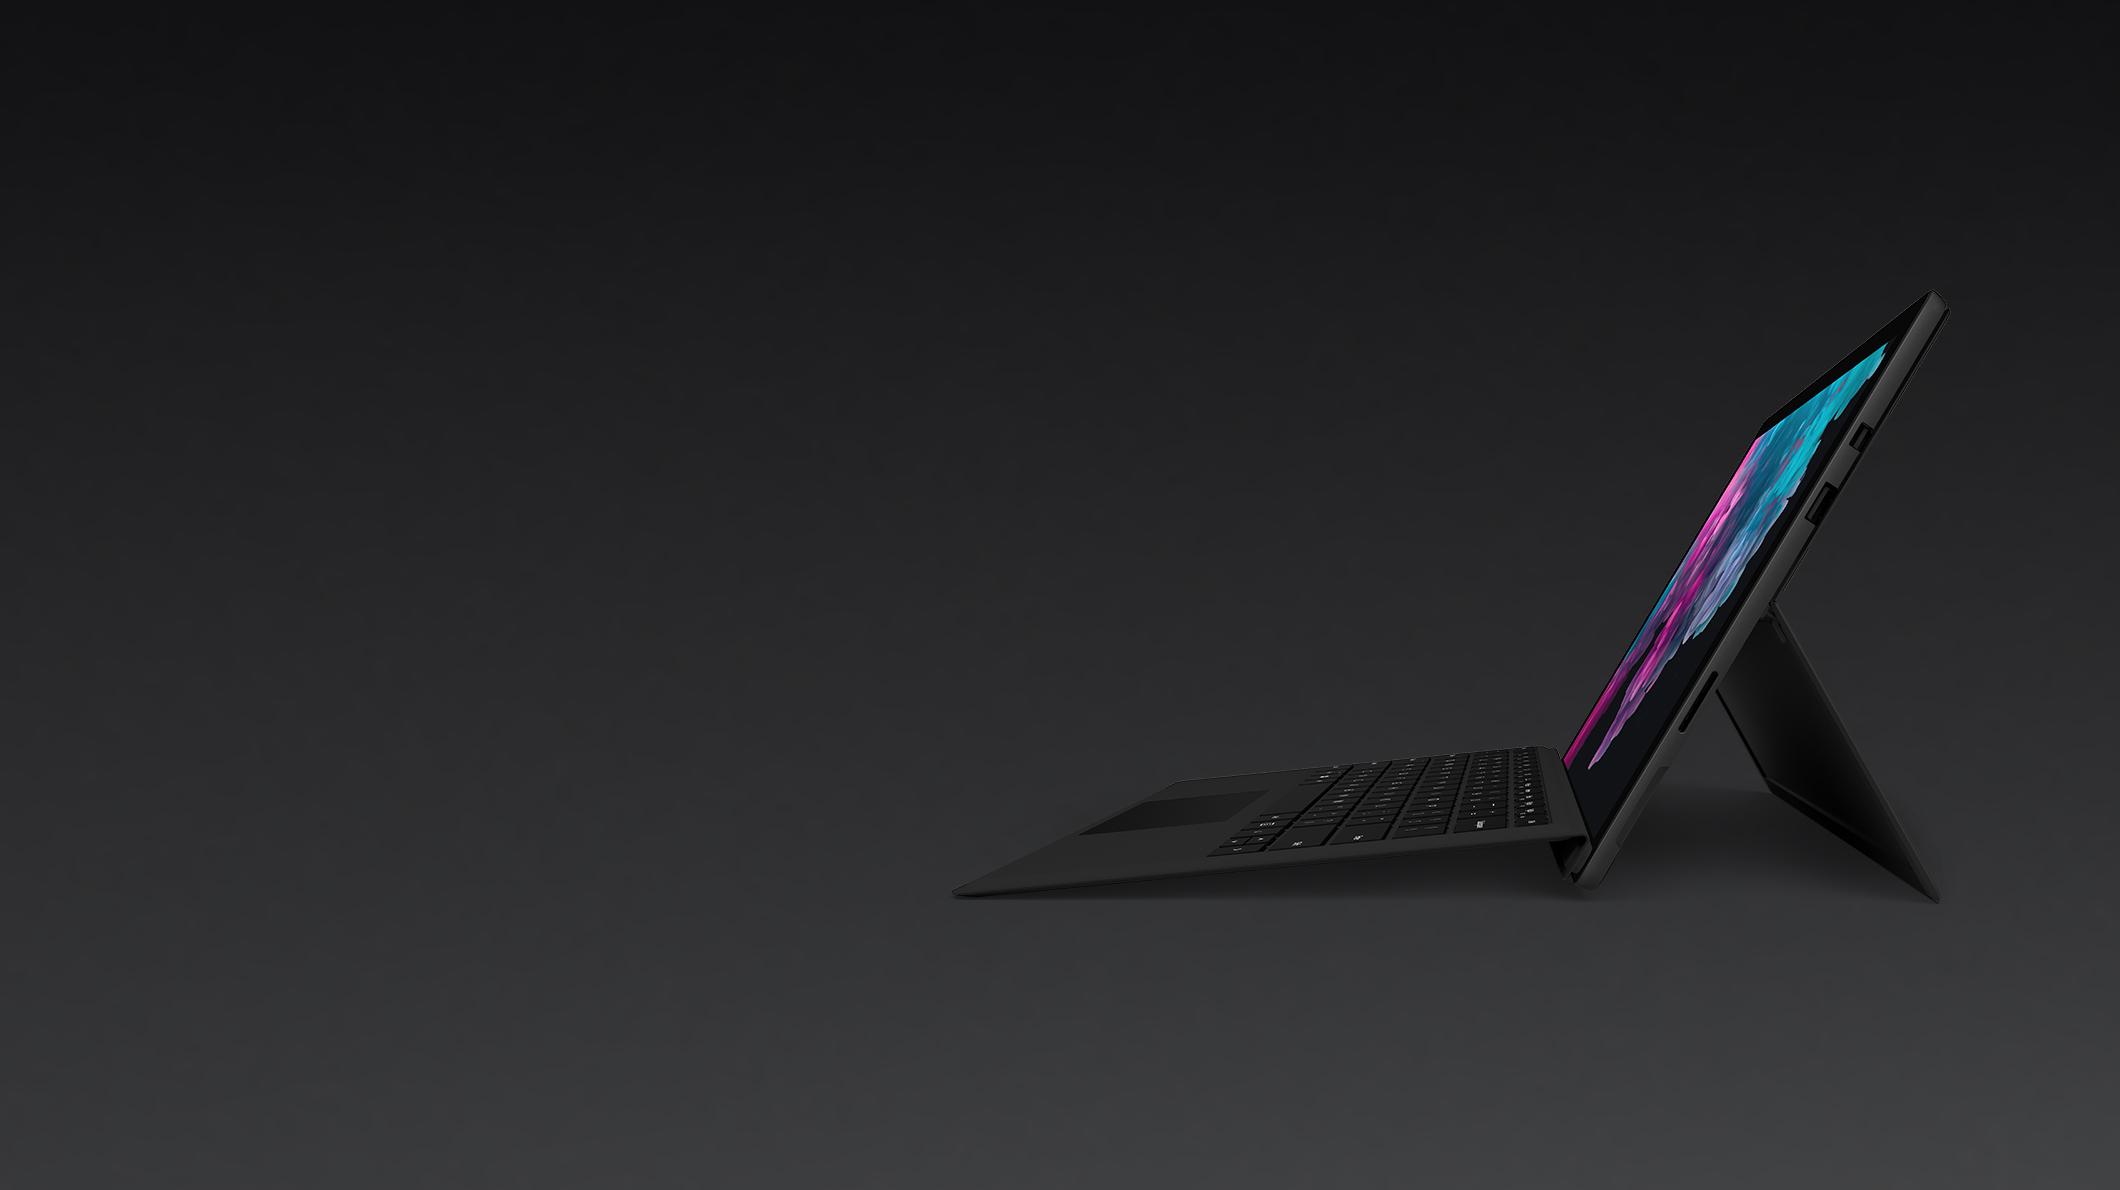 A Surface Pro 6